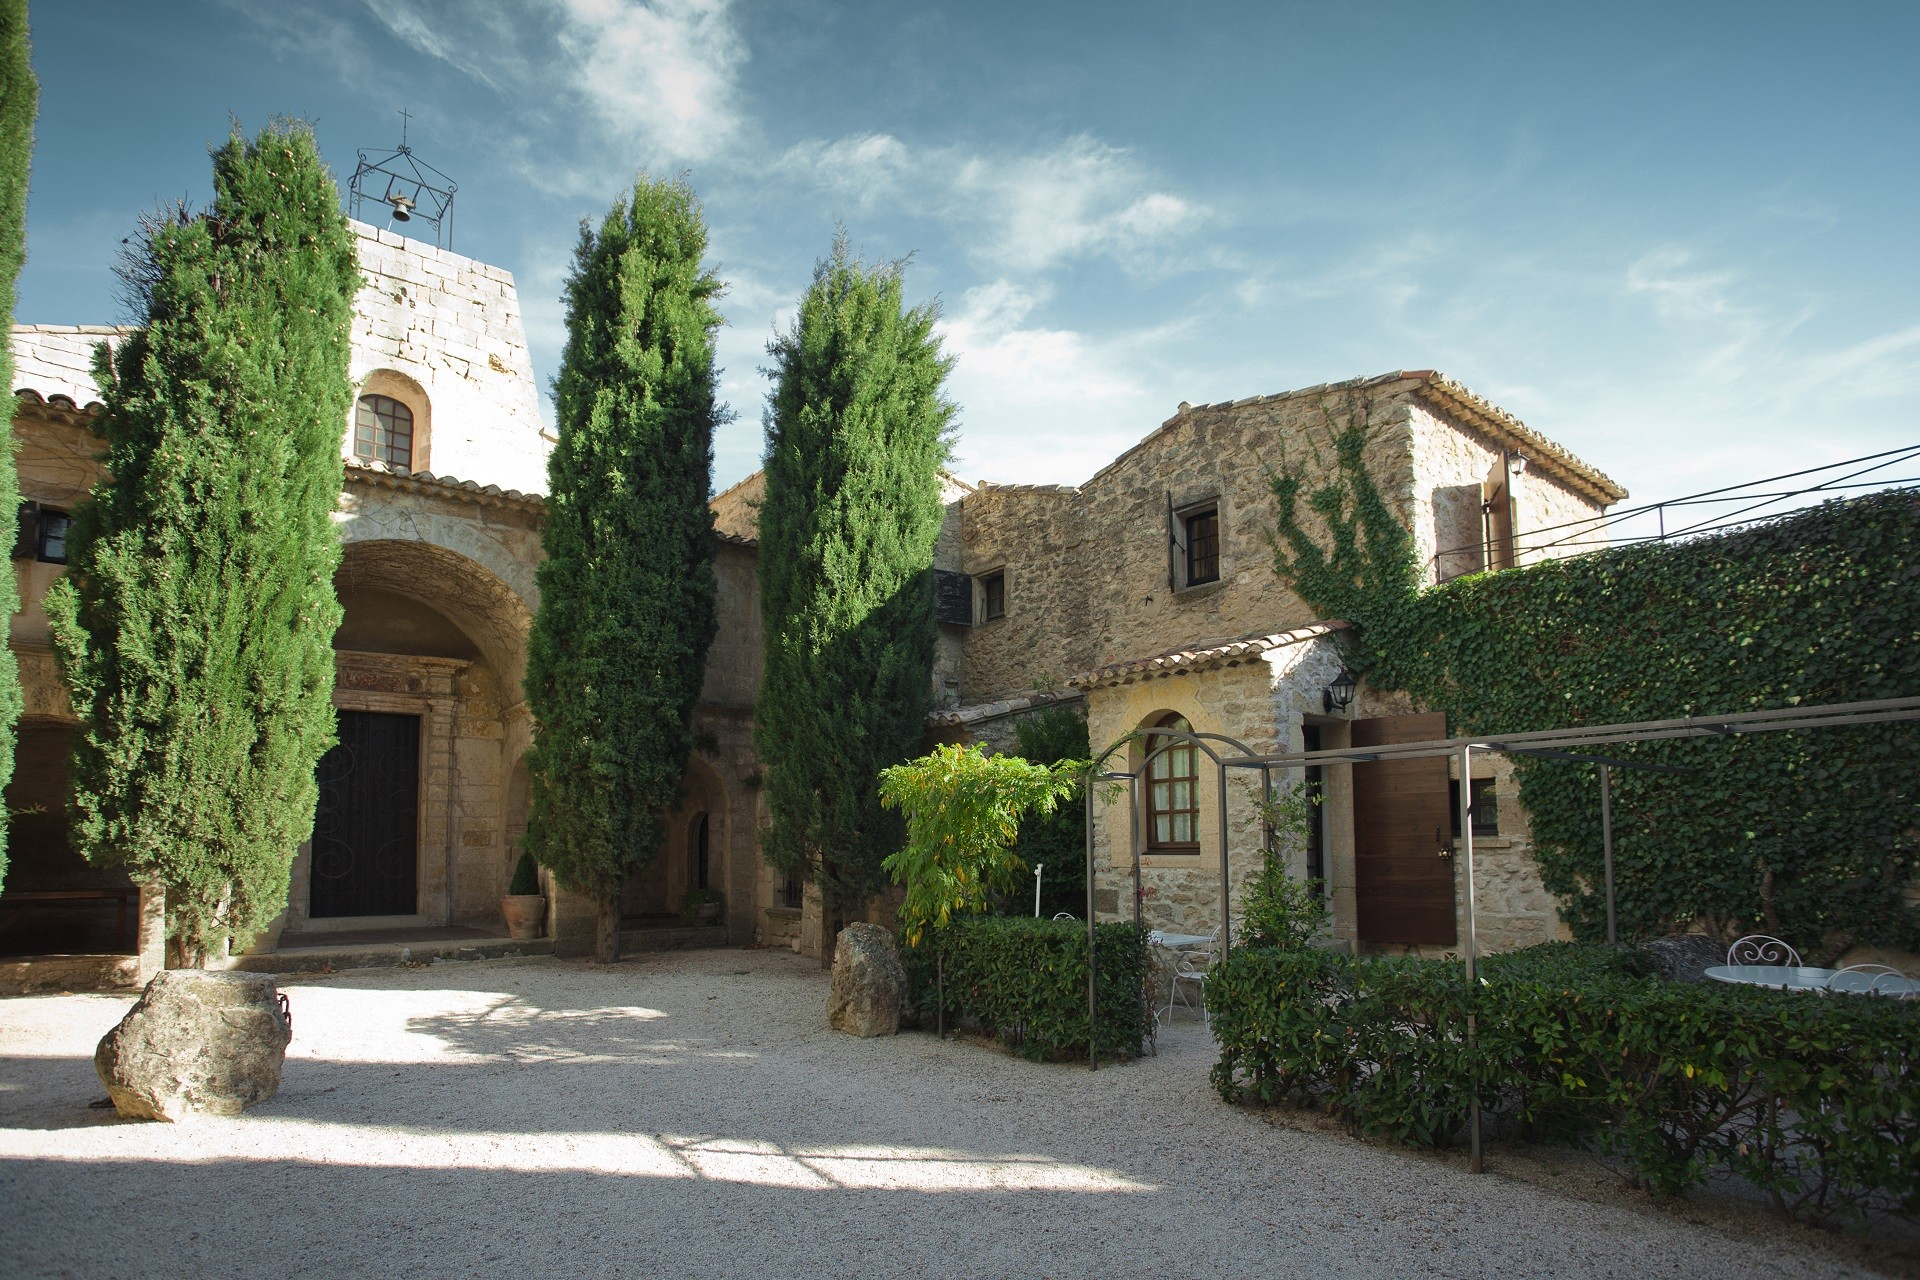 Abbaye-de-Sainte-Croix-provence-luberon-patio-Seminaires-de-caractere